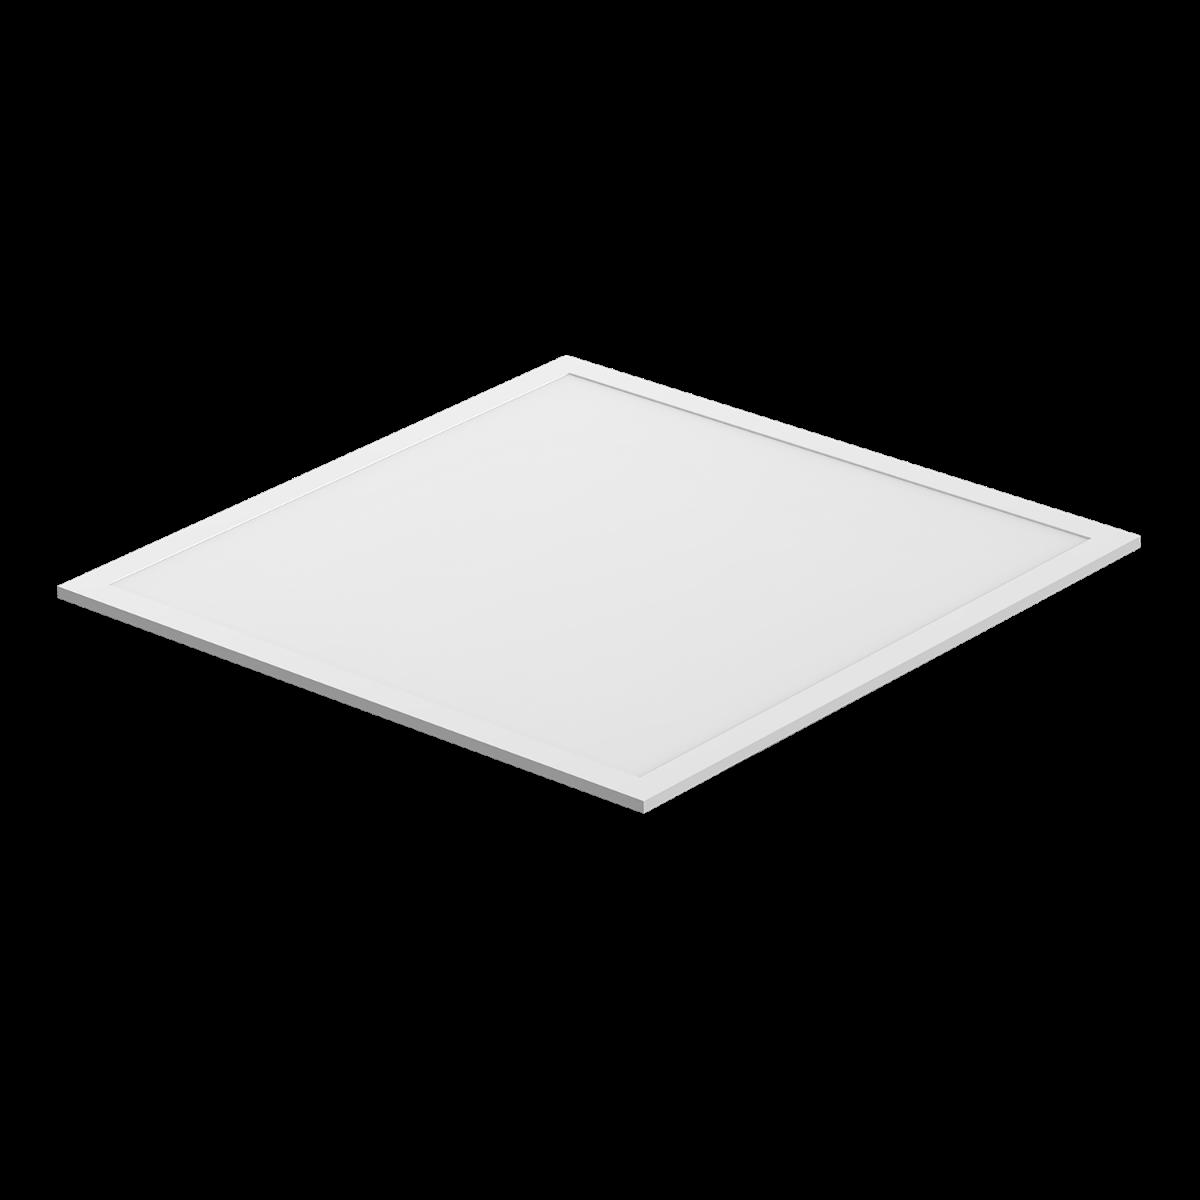 Noxion LED Paneel Econox 32W 60x60cm 4000K 4400lm UGR <22 | Koel Wit - Vervangt 4x18W